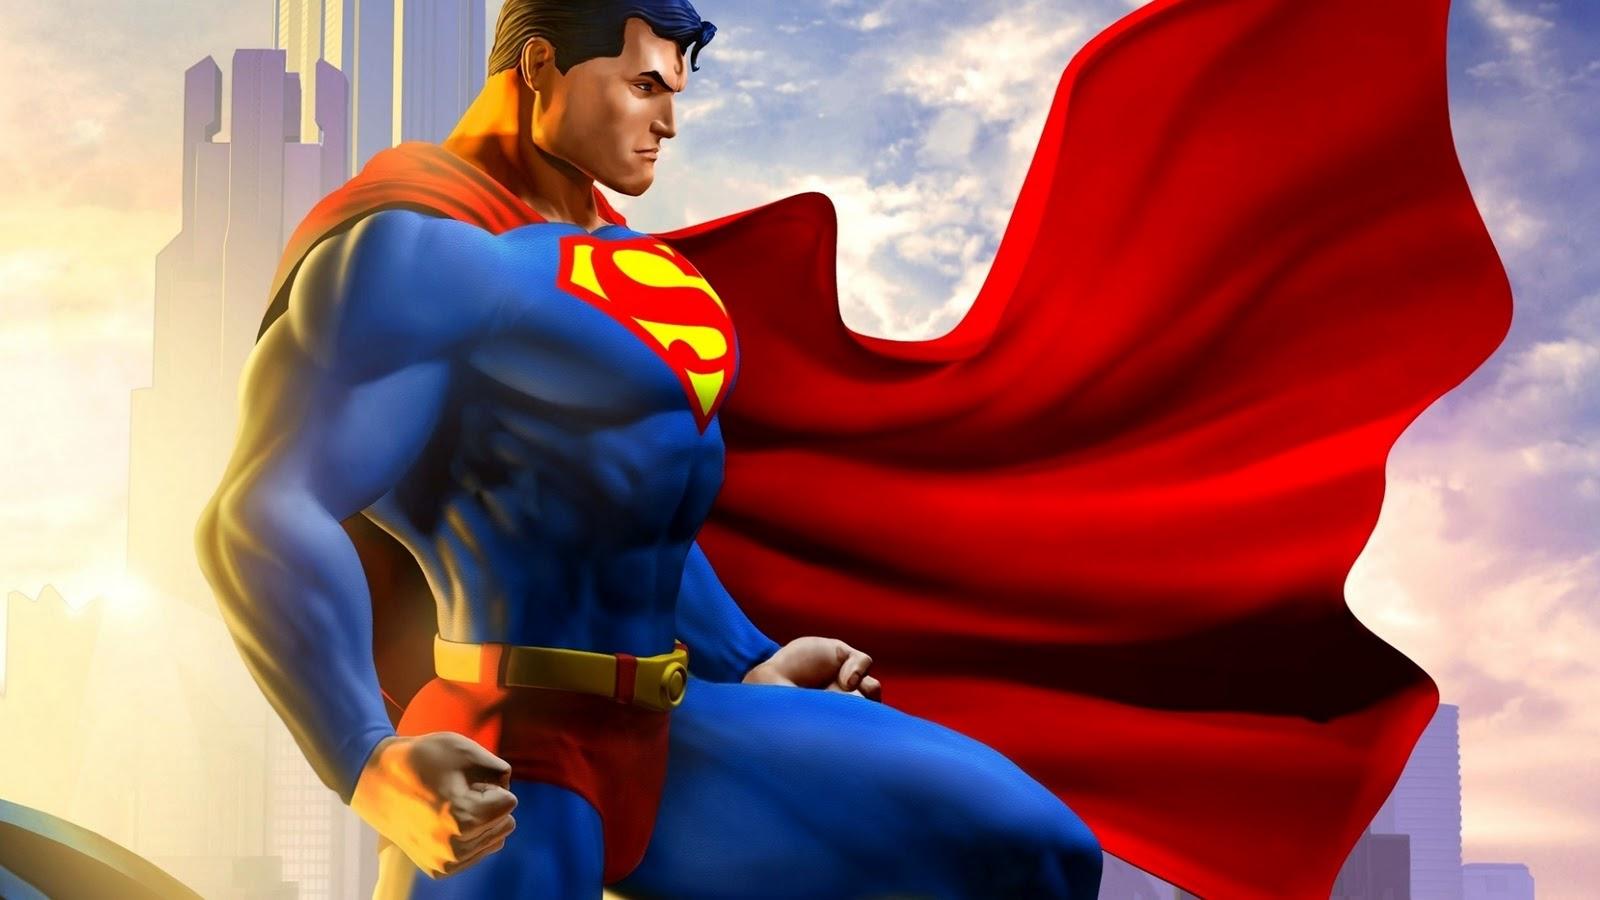 Hd Wallpaper Superman | Free Download Wallpaper | DaWallpaperz